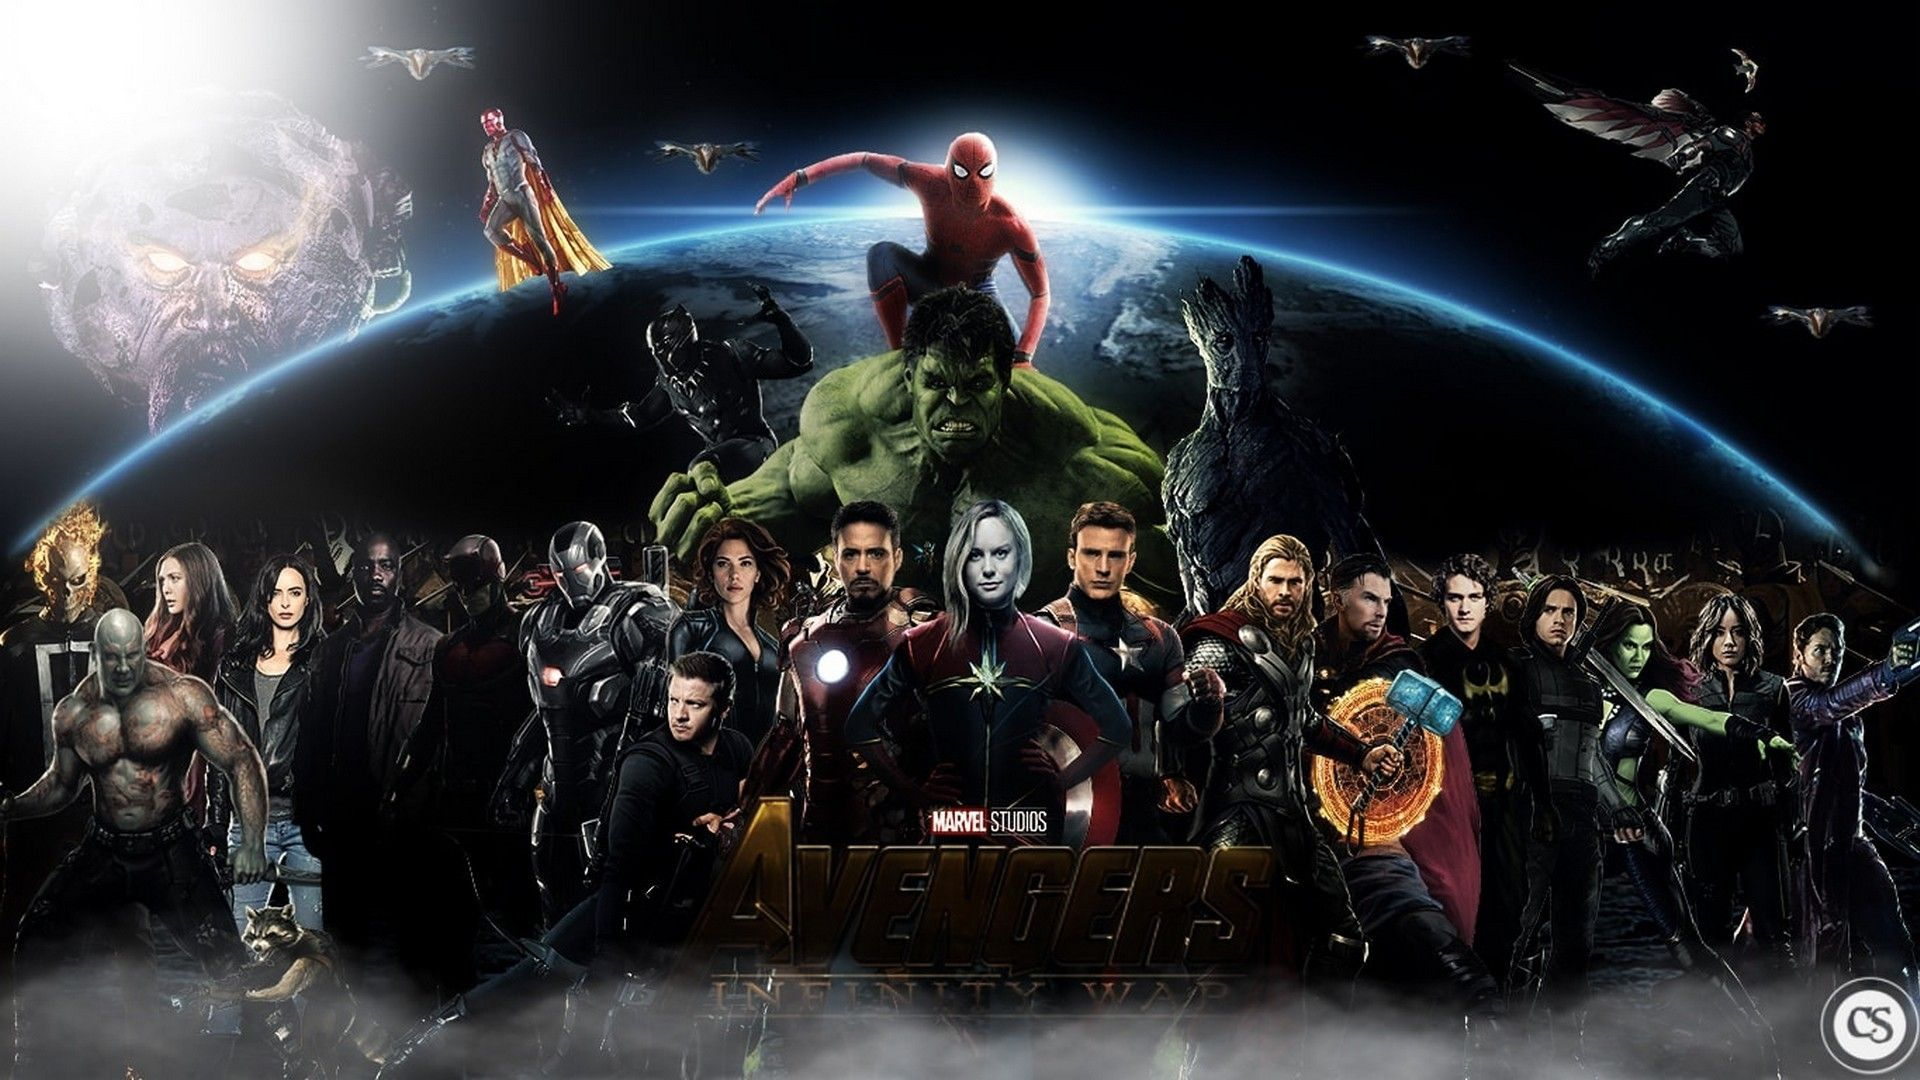 Wallpaper Hd Avengers Infinity War Characters 2021 Live Wallpaper Hd Avengers Wallpaper Avengers Avengers Infinity War